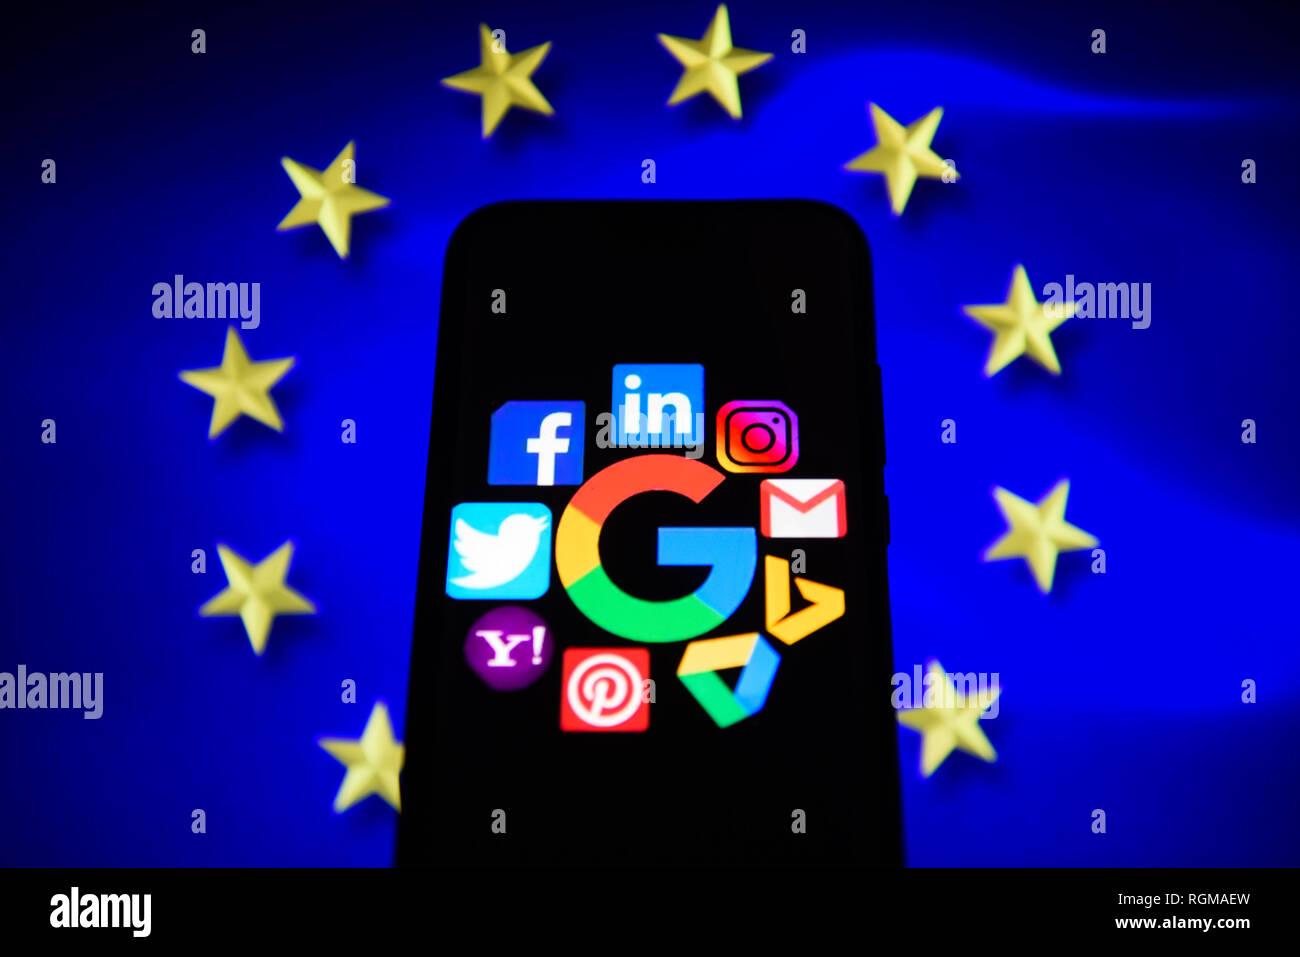 Cracovia In Polonia 30 Gen 2019 Social Media Logo Sono Visti Da